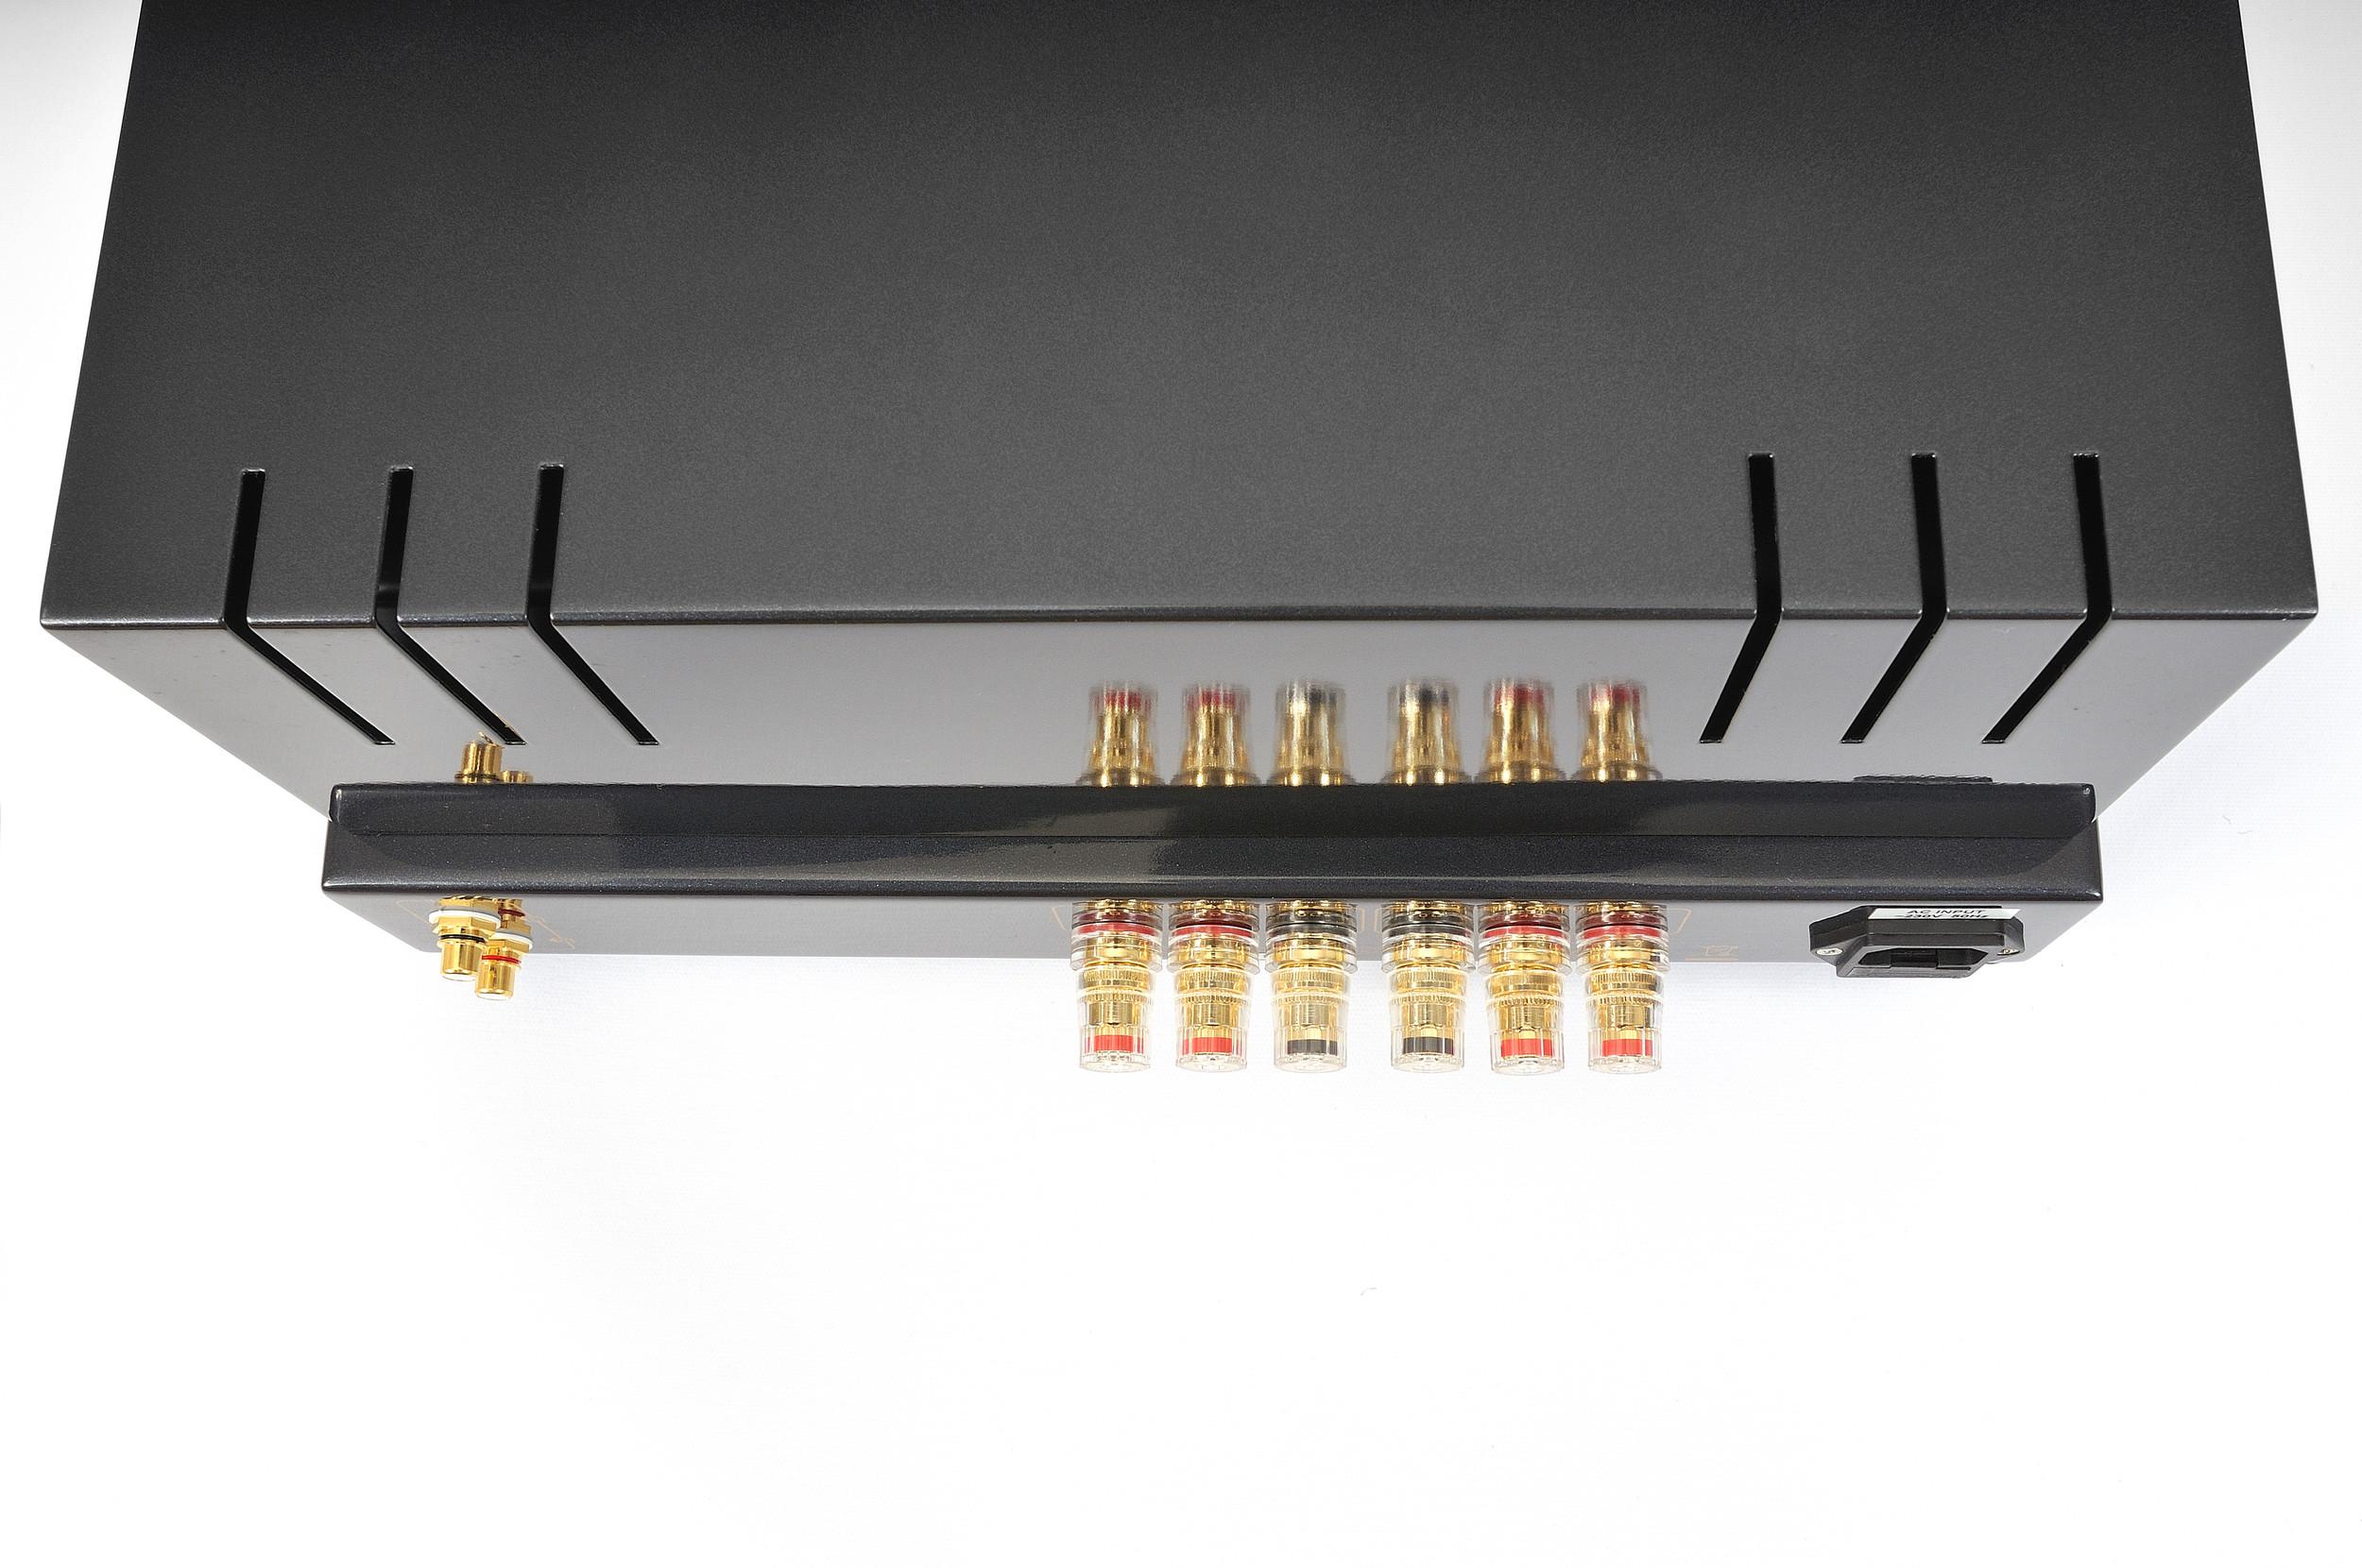 ProLogue Premium Stereo Amplifier - black - special shot (1) - HR - JPG.jpg